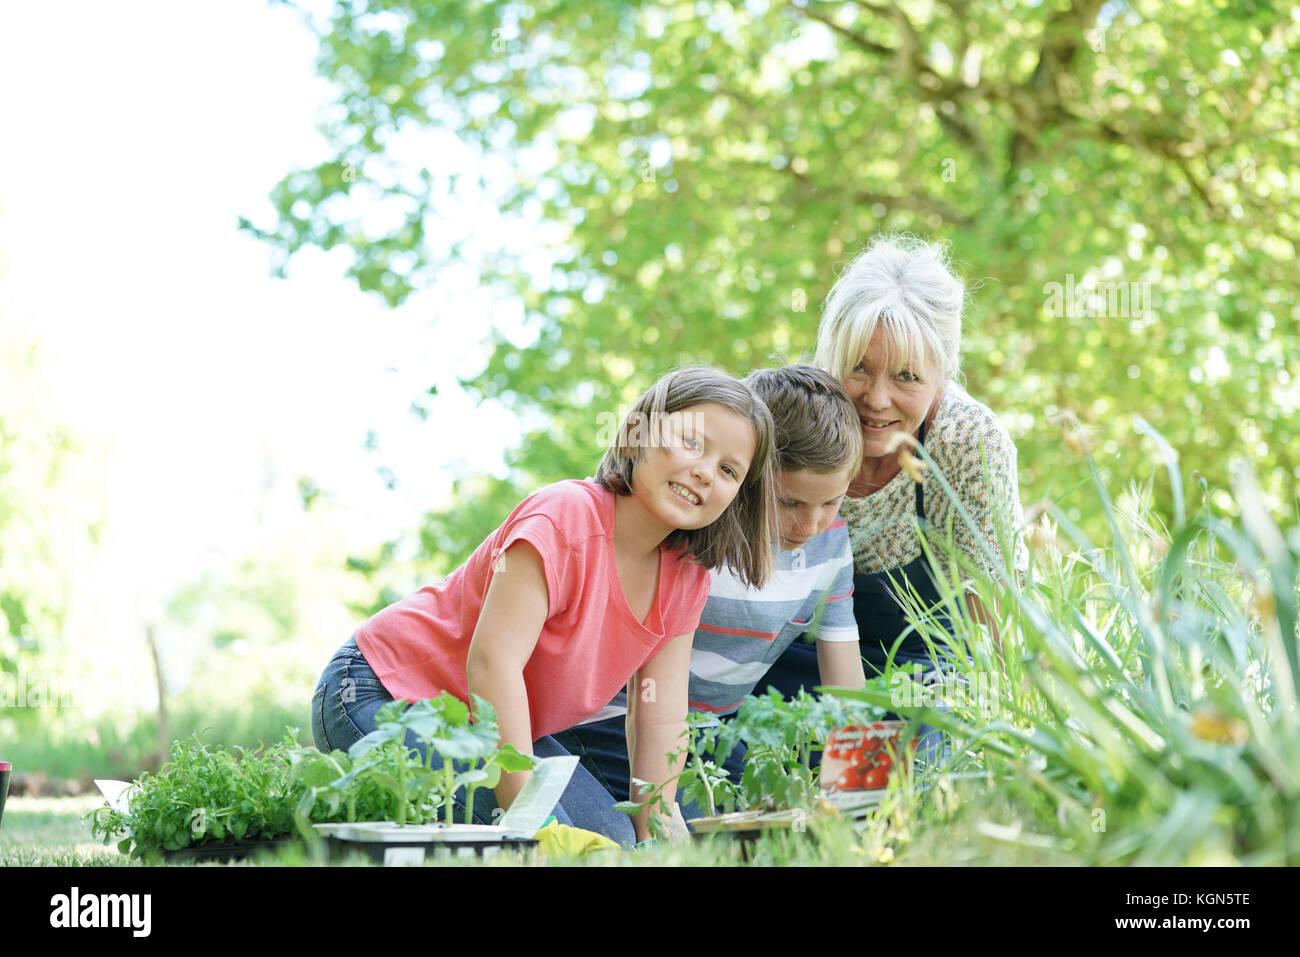 Elderly woman having fun gardening with grandkids - Stock Image